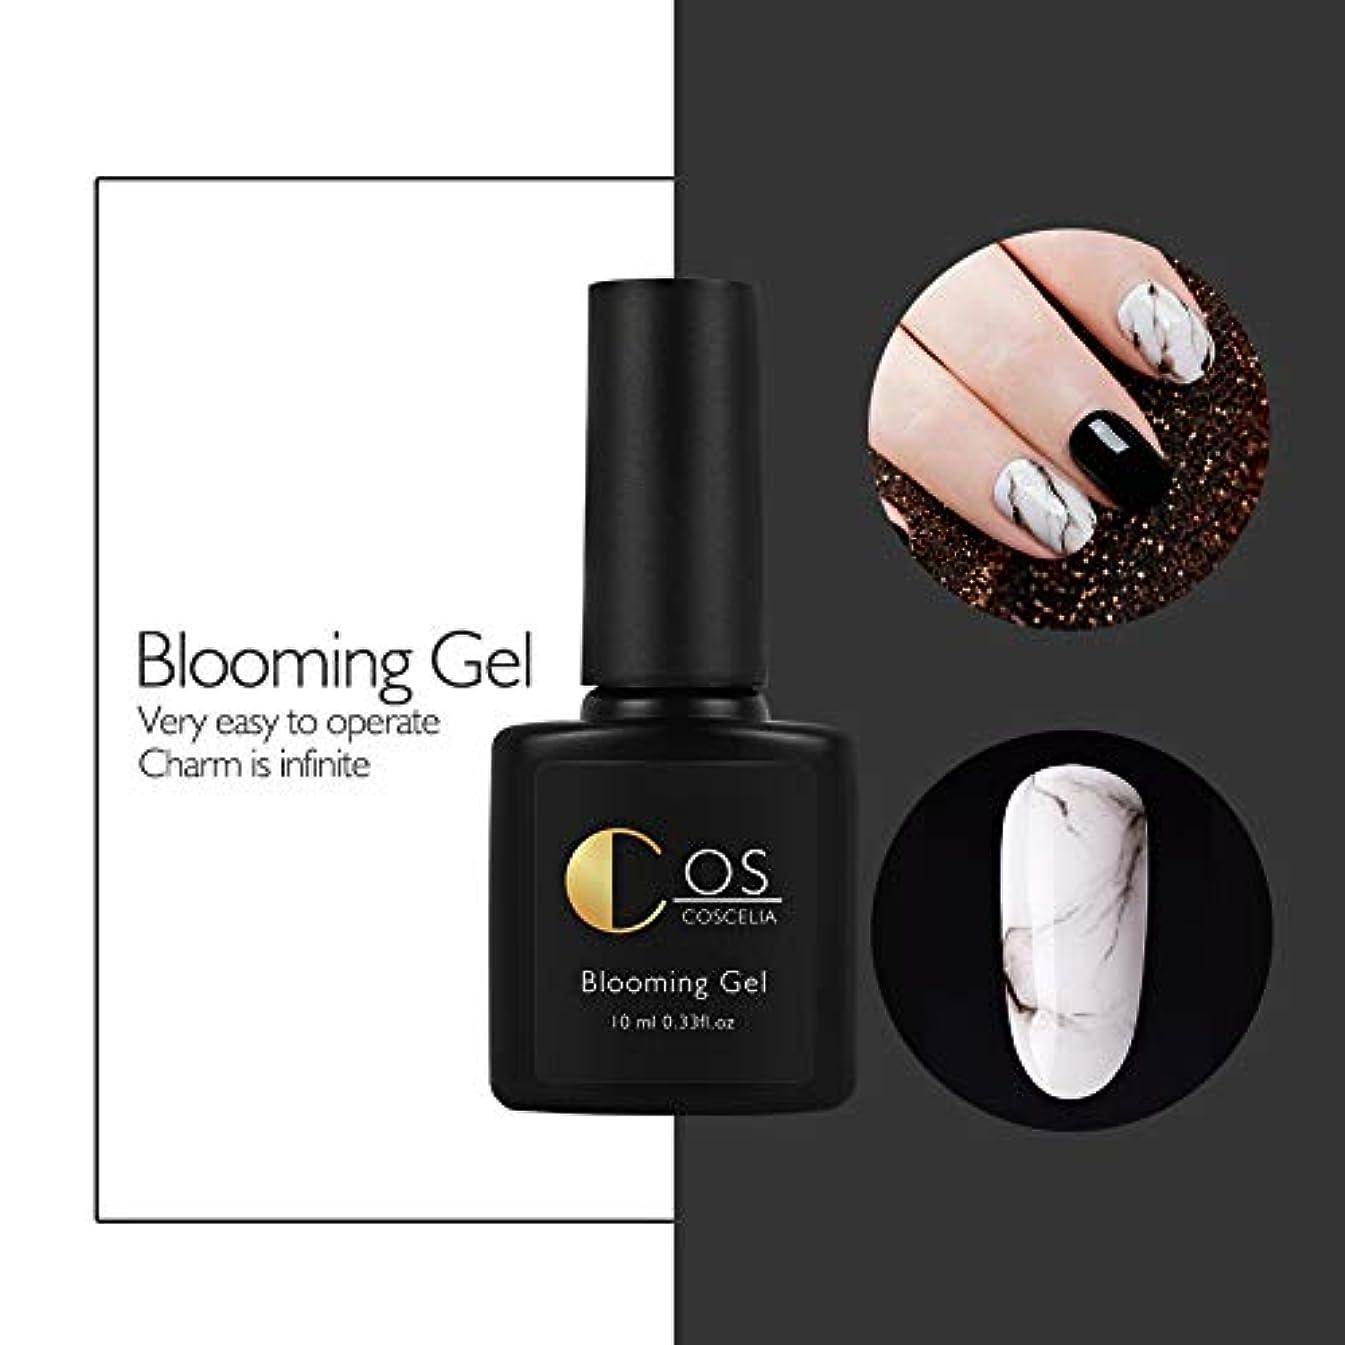 Twinkle Storeジェルネイル クリアブルーミングジェル 自宅ネイル セルフネイル clear blooming gel